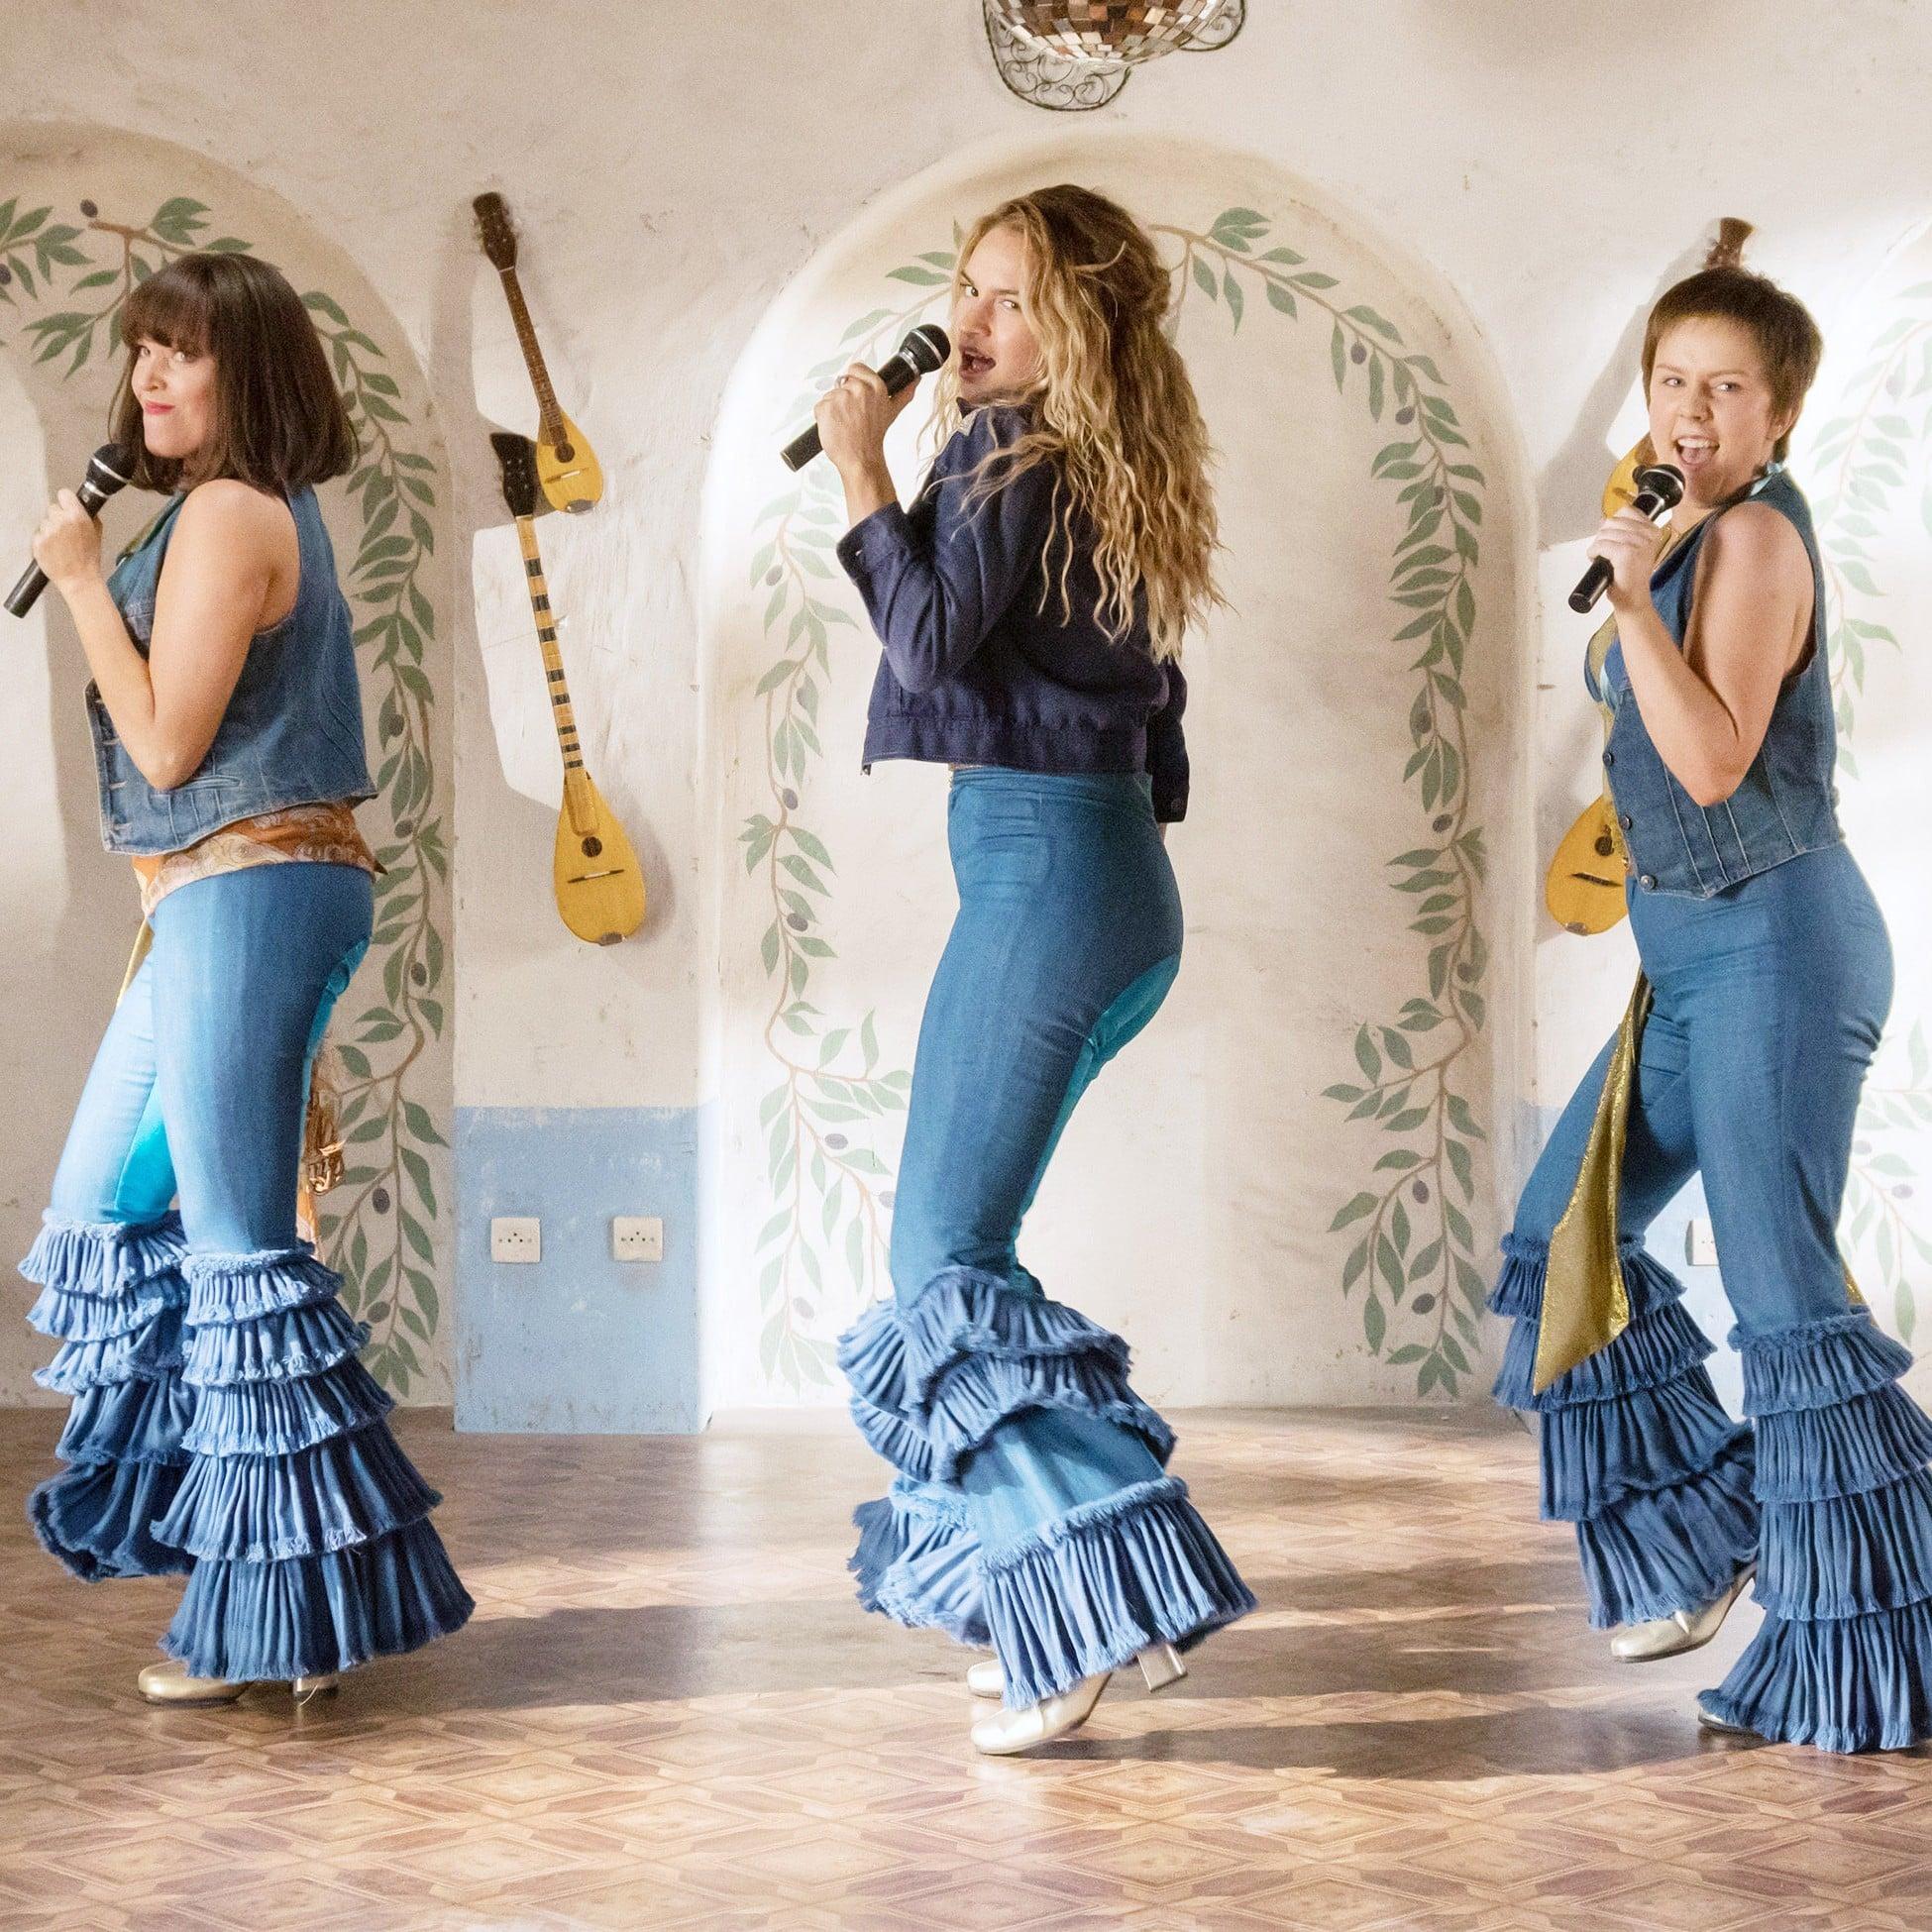 pop culture halloween costumes for women 2018 | popsugar entertainment